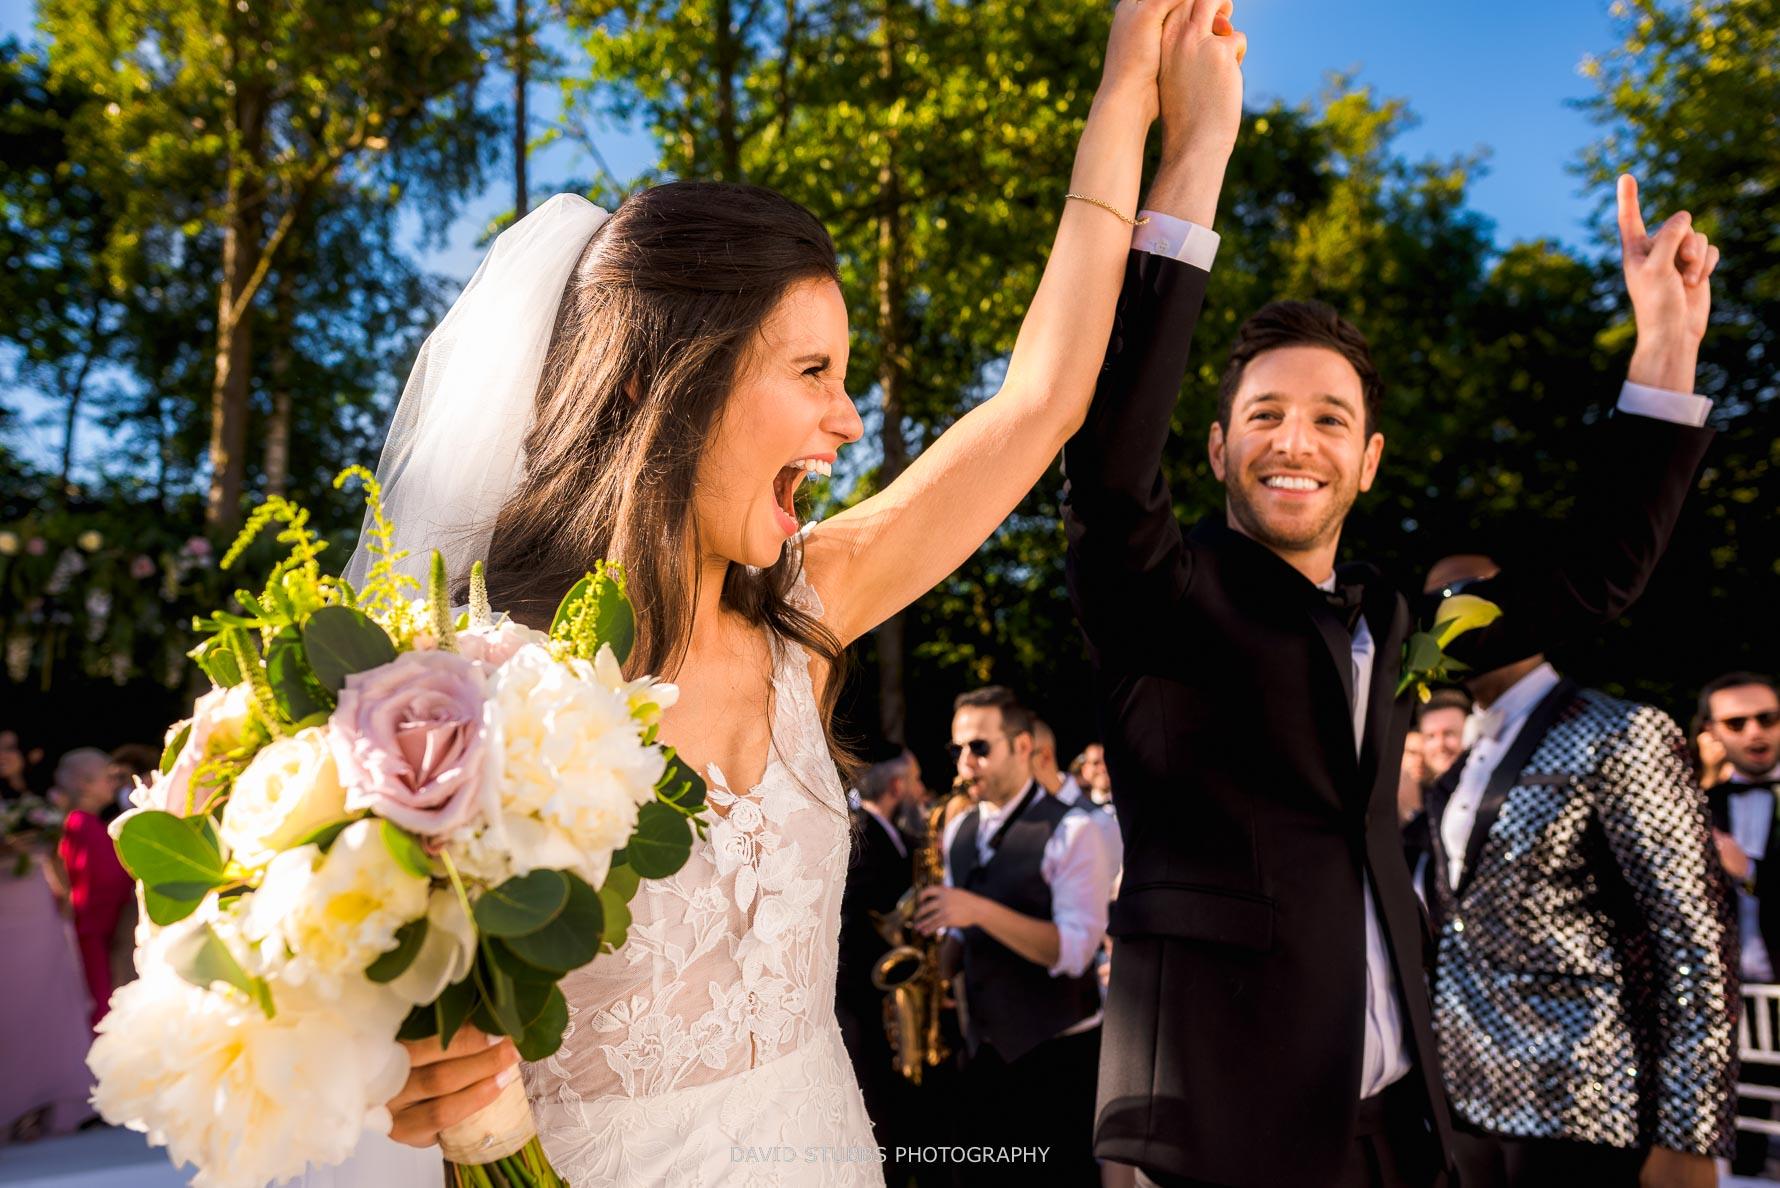 celebrating just got married